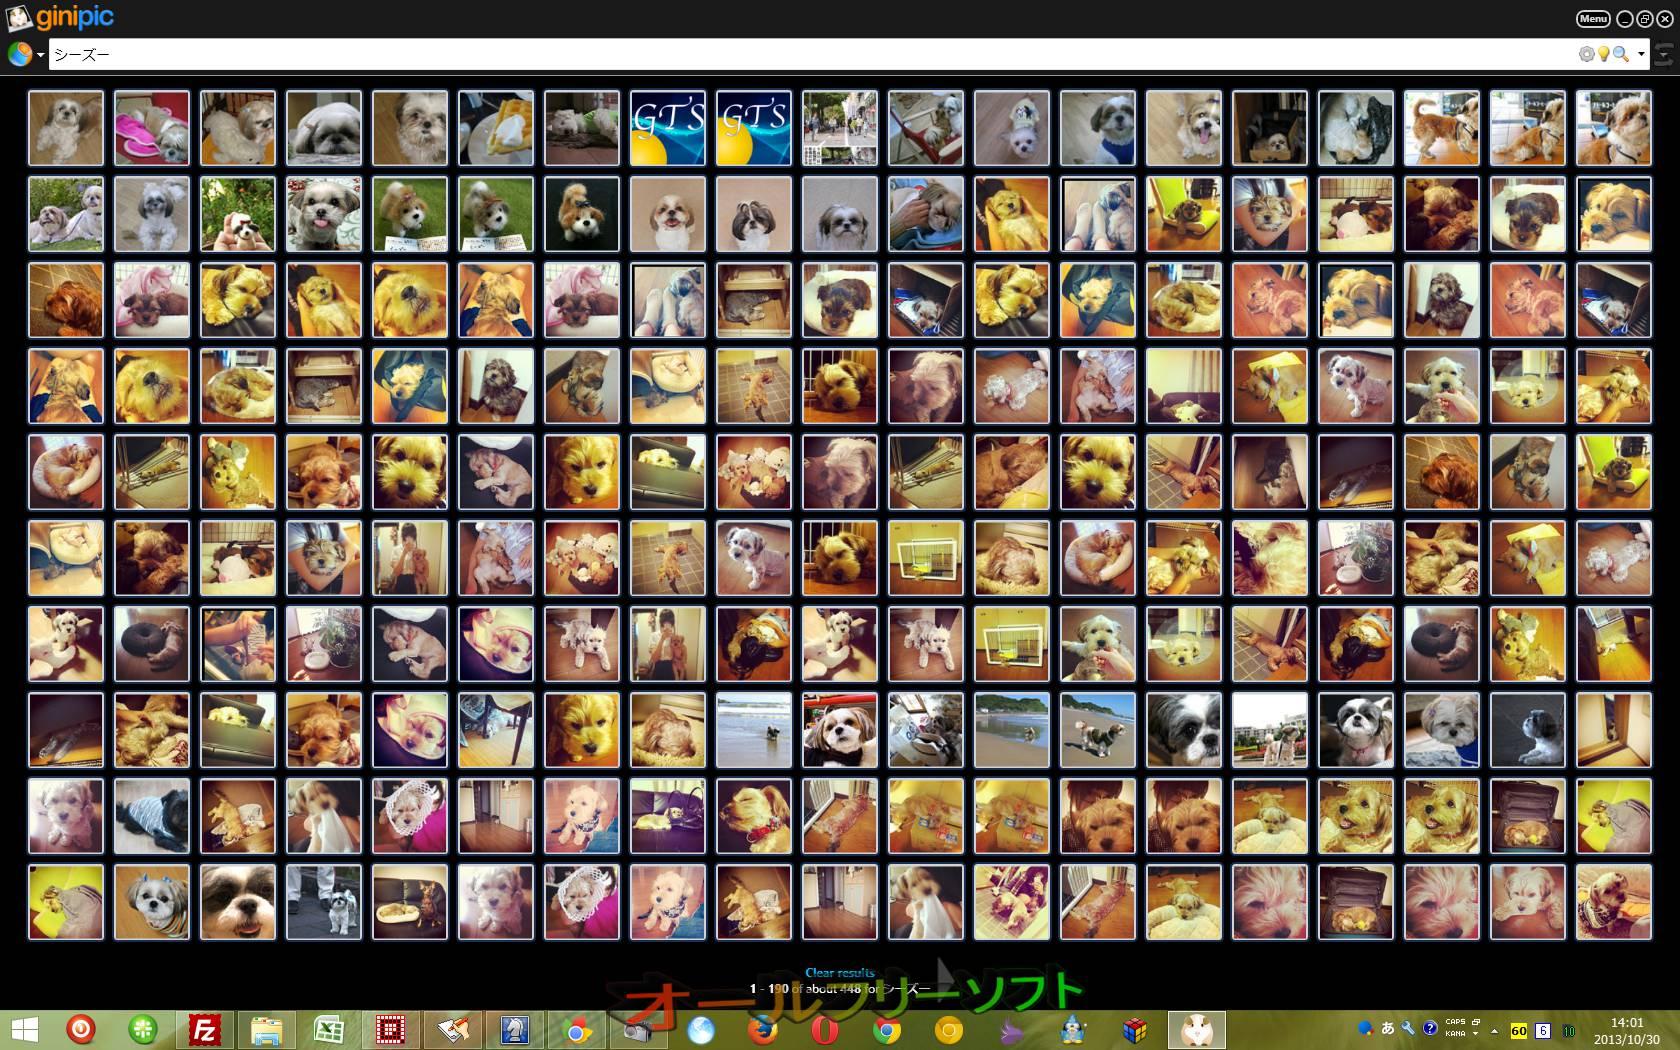 Ginipic--起動時の画面/Maximize--オールフリーソフト